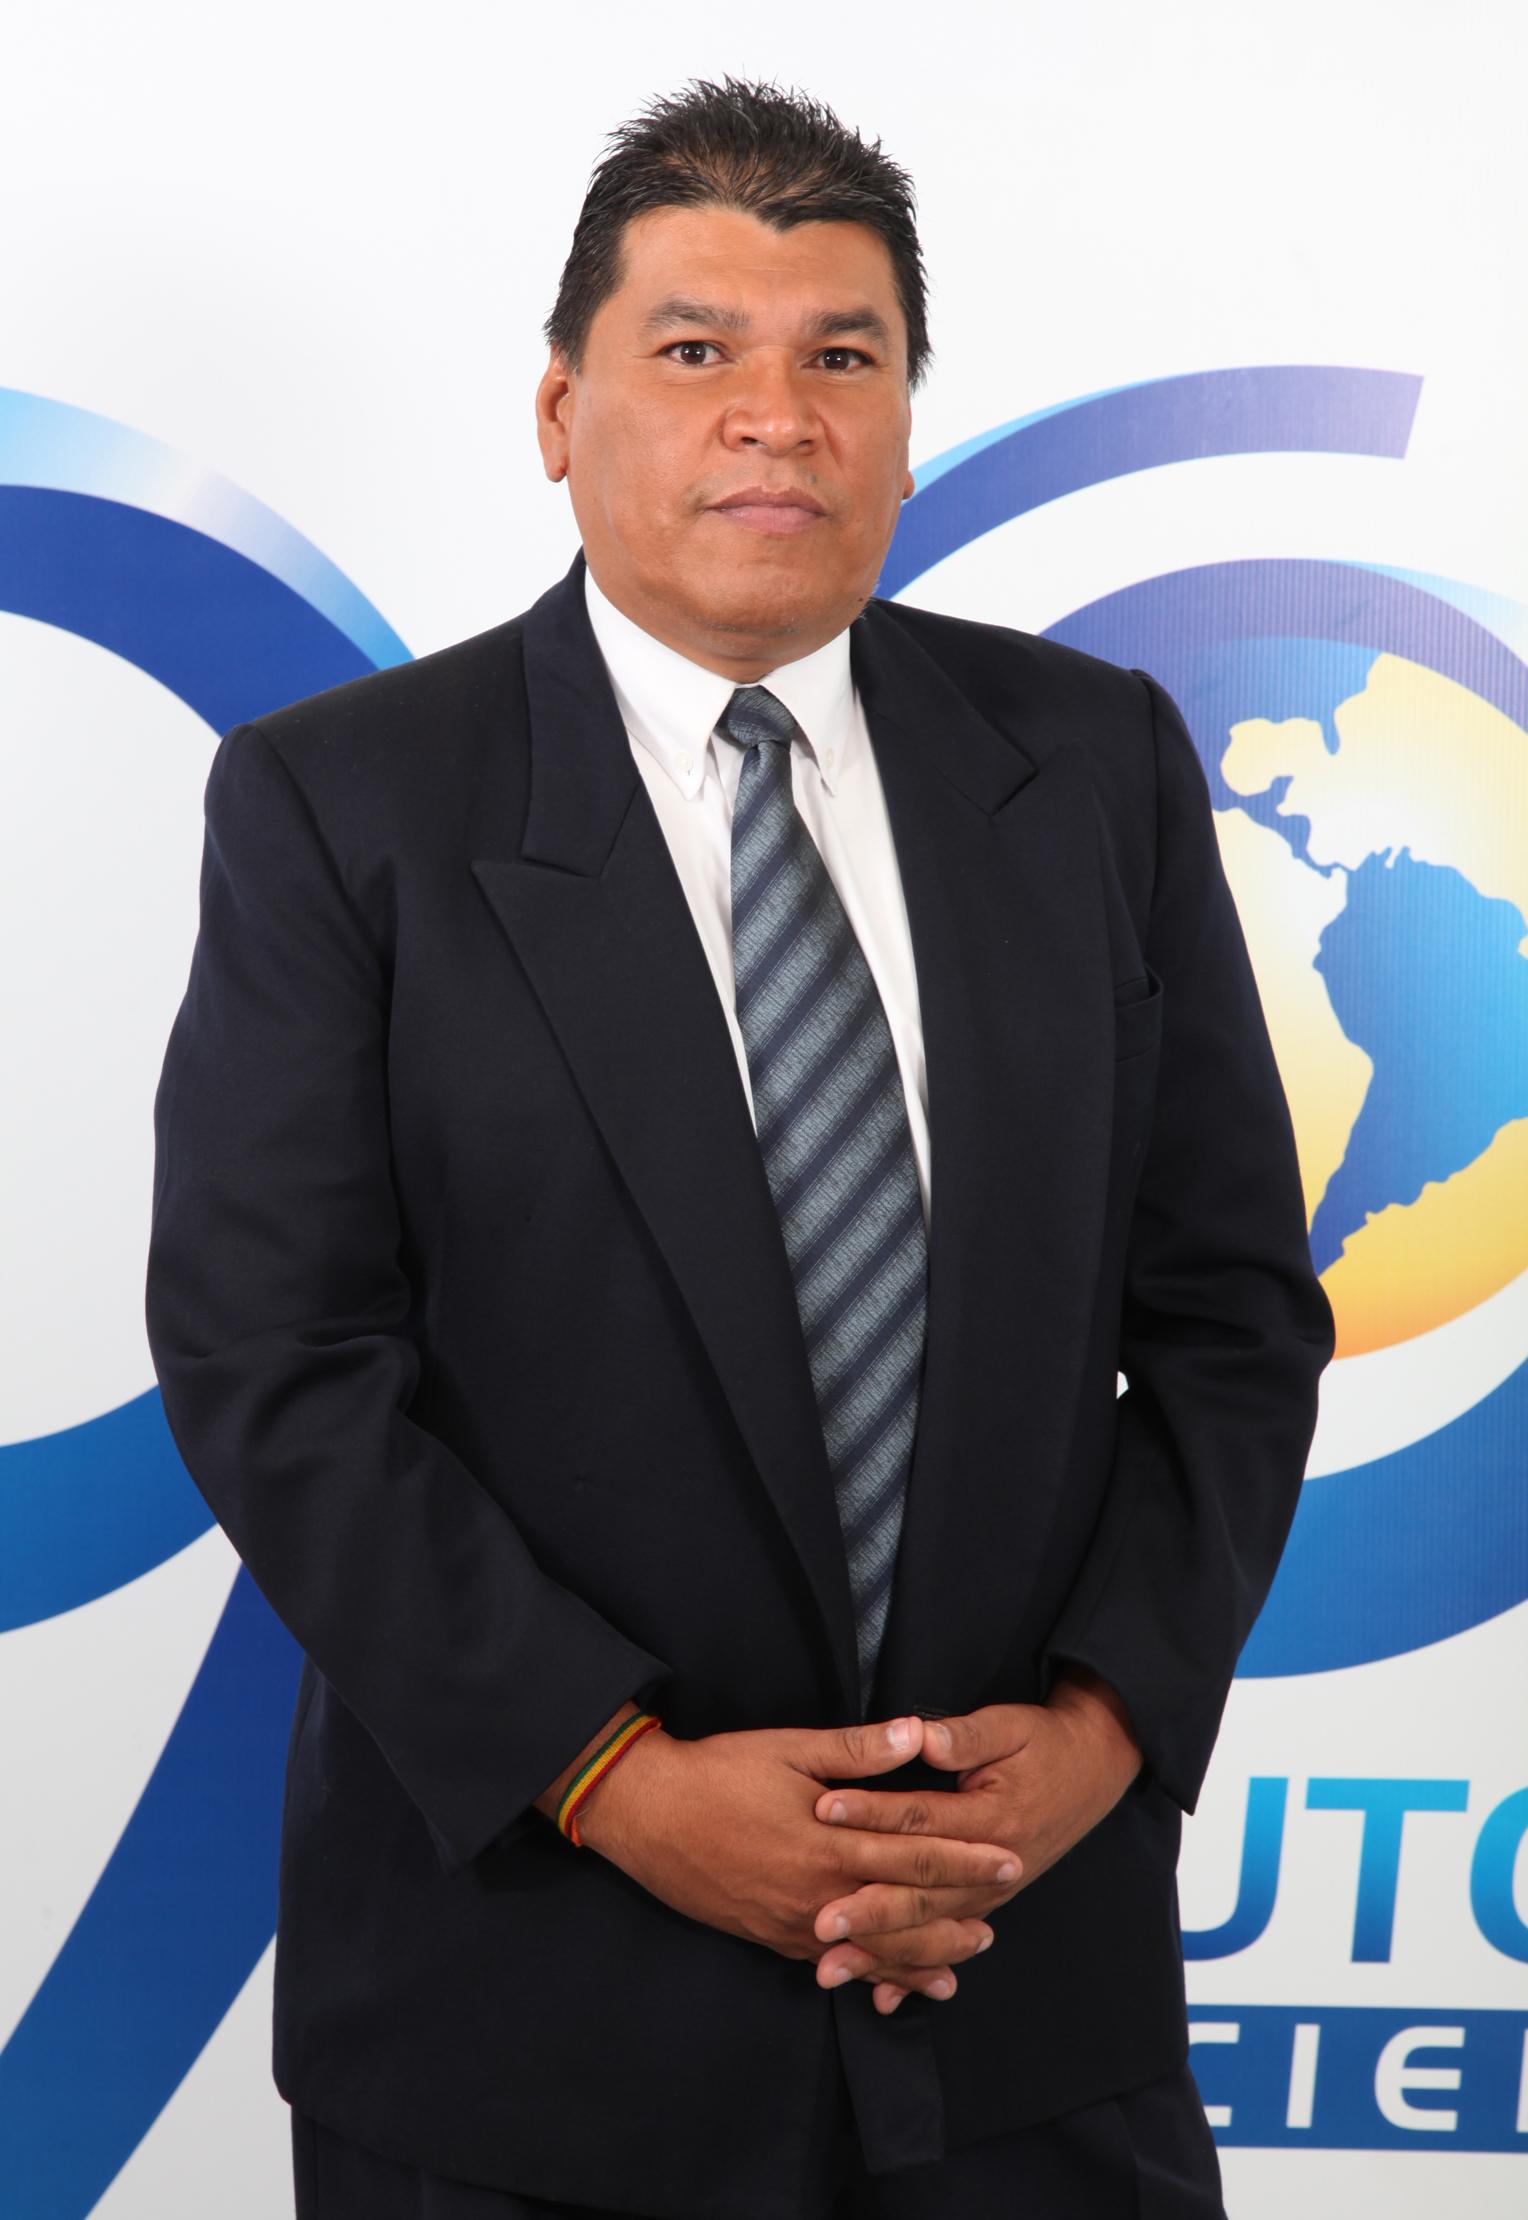 Miguel Ángel Palta